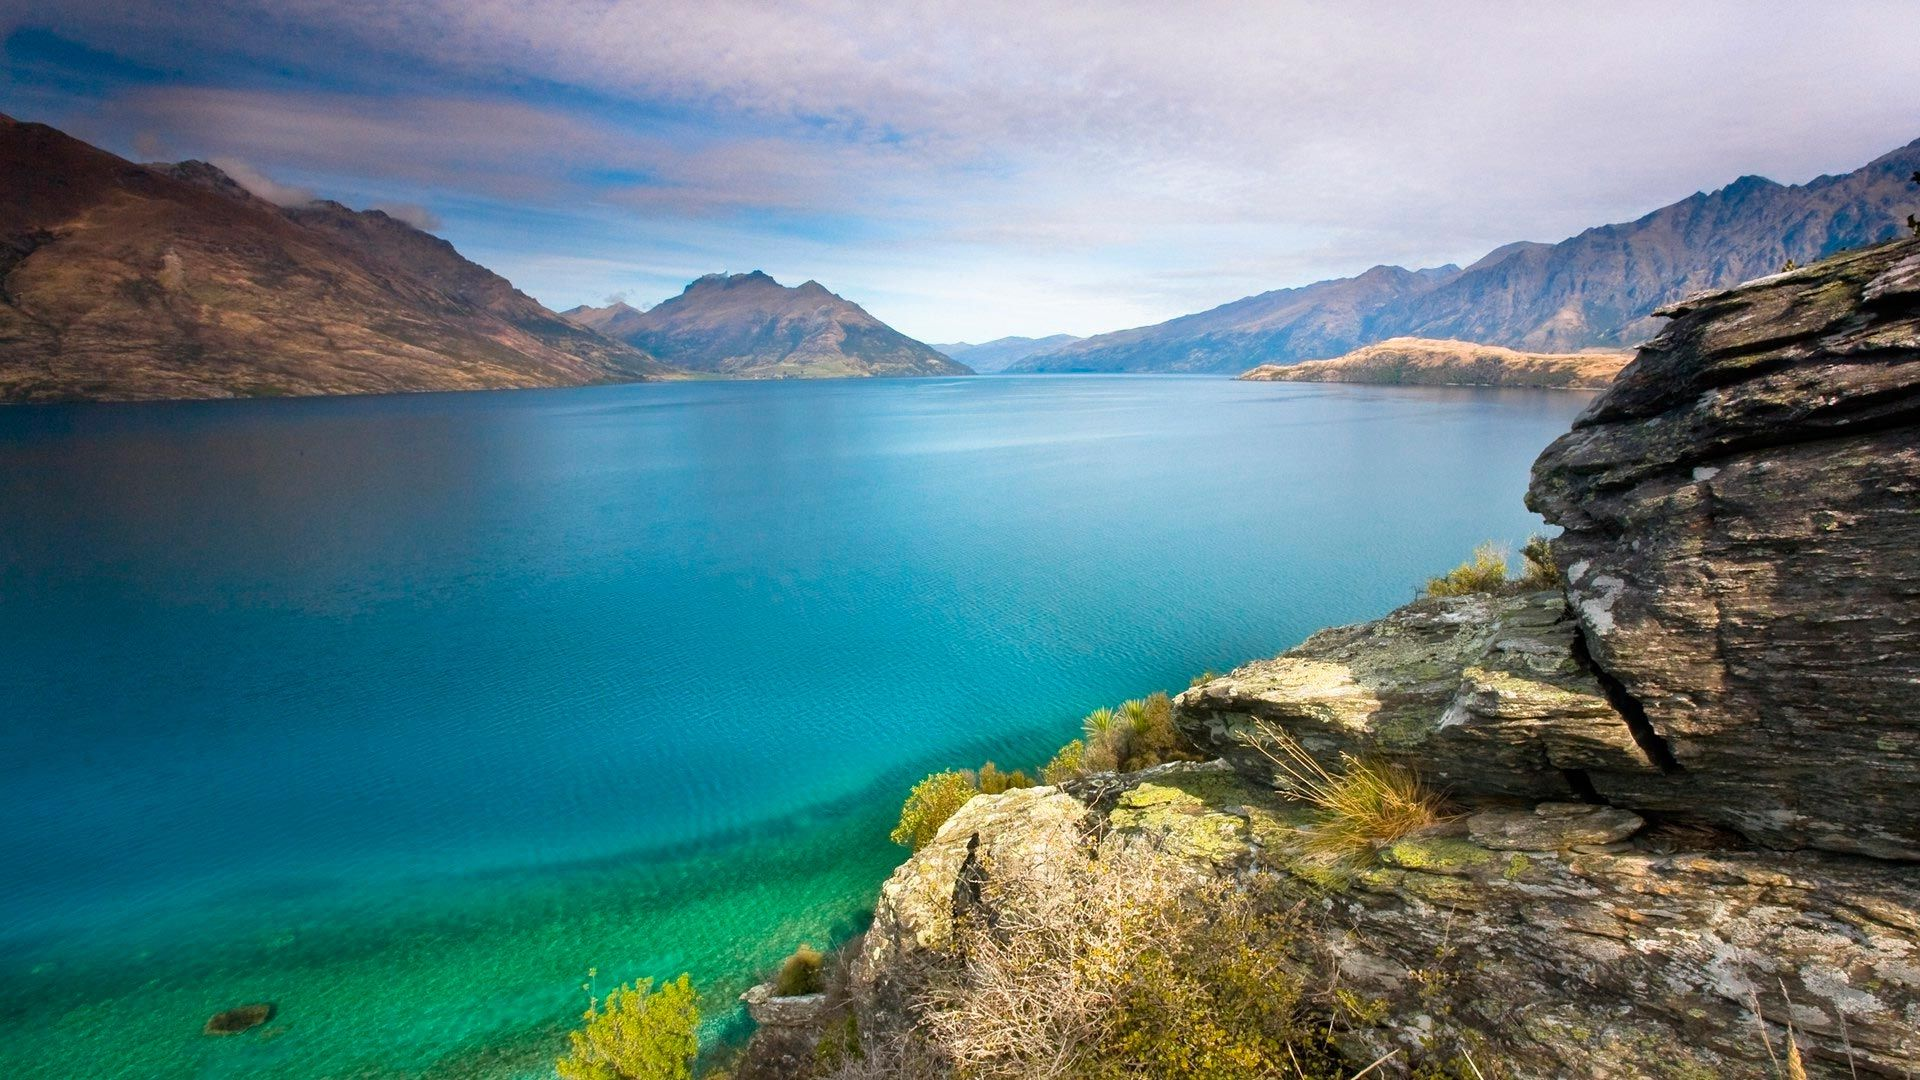 New Zealand wallpaper hd